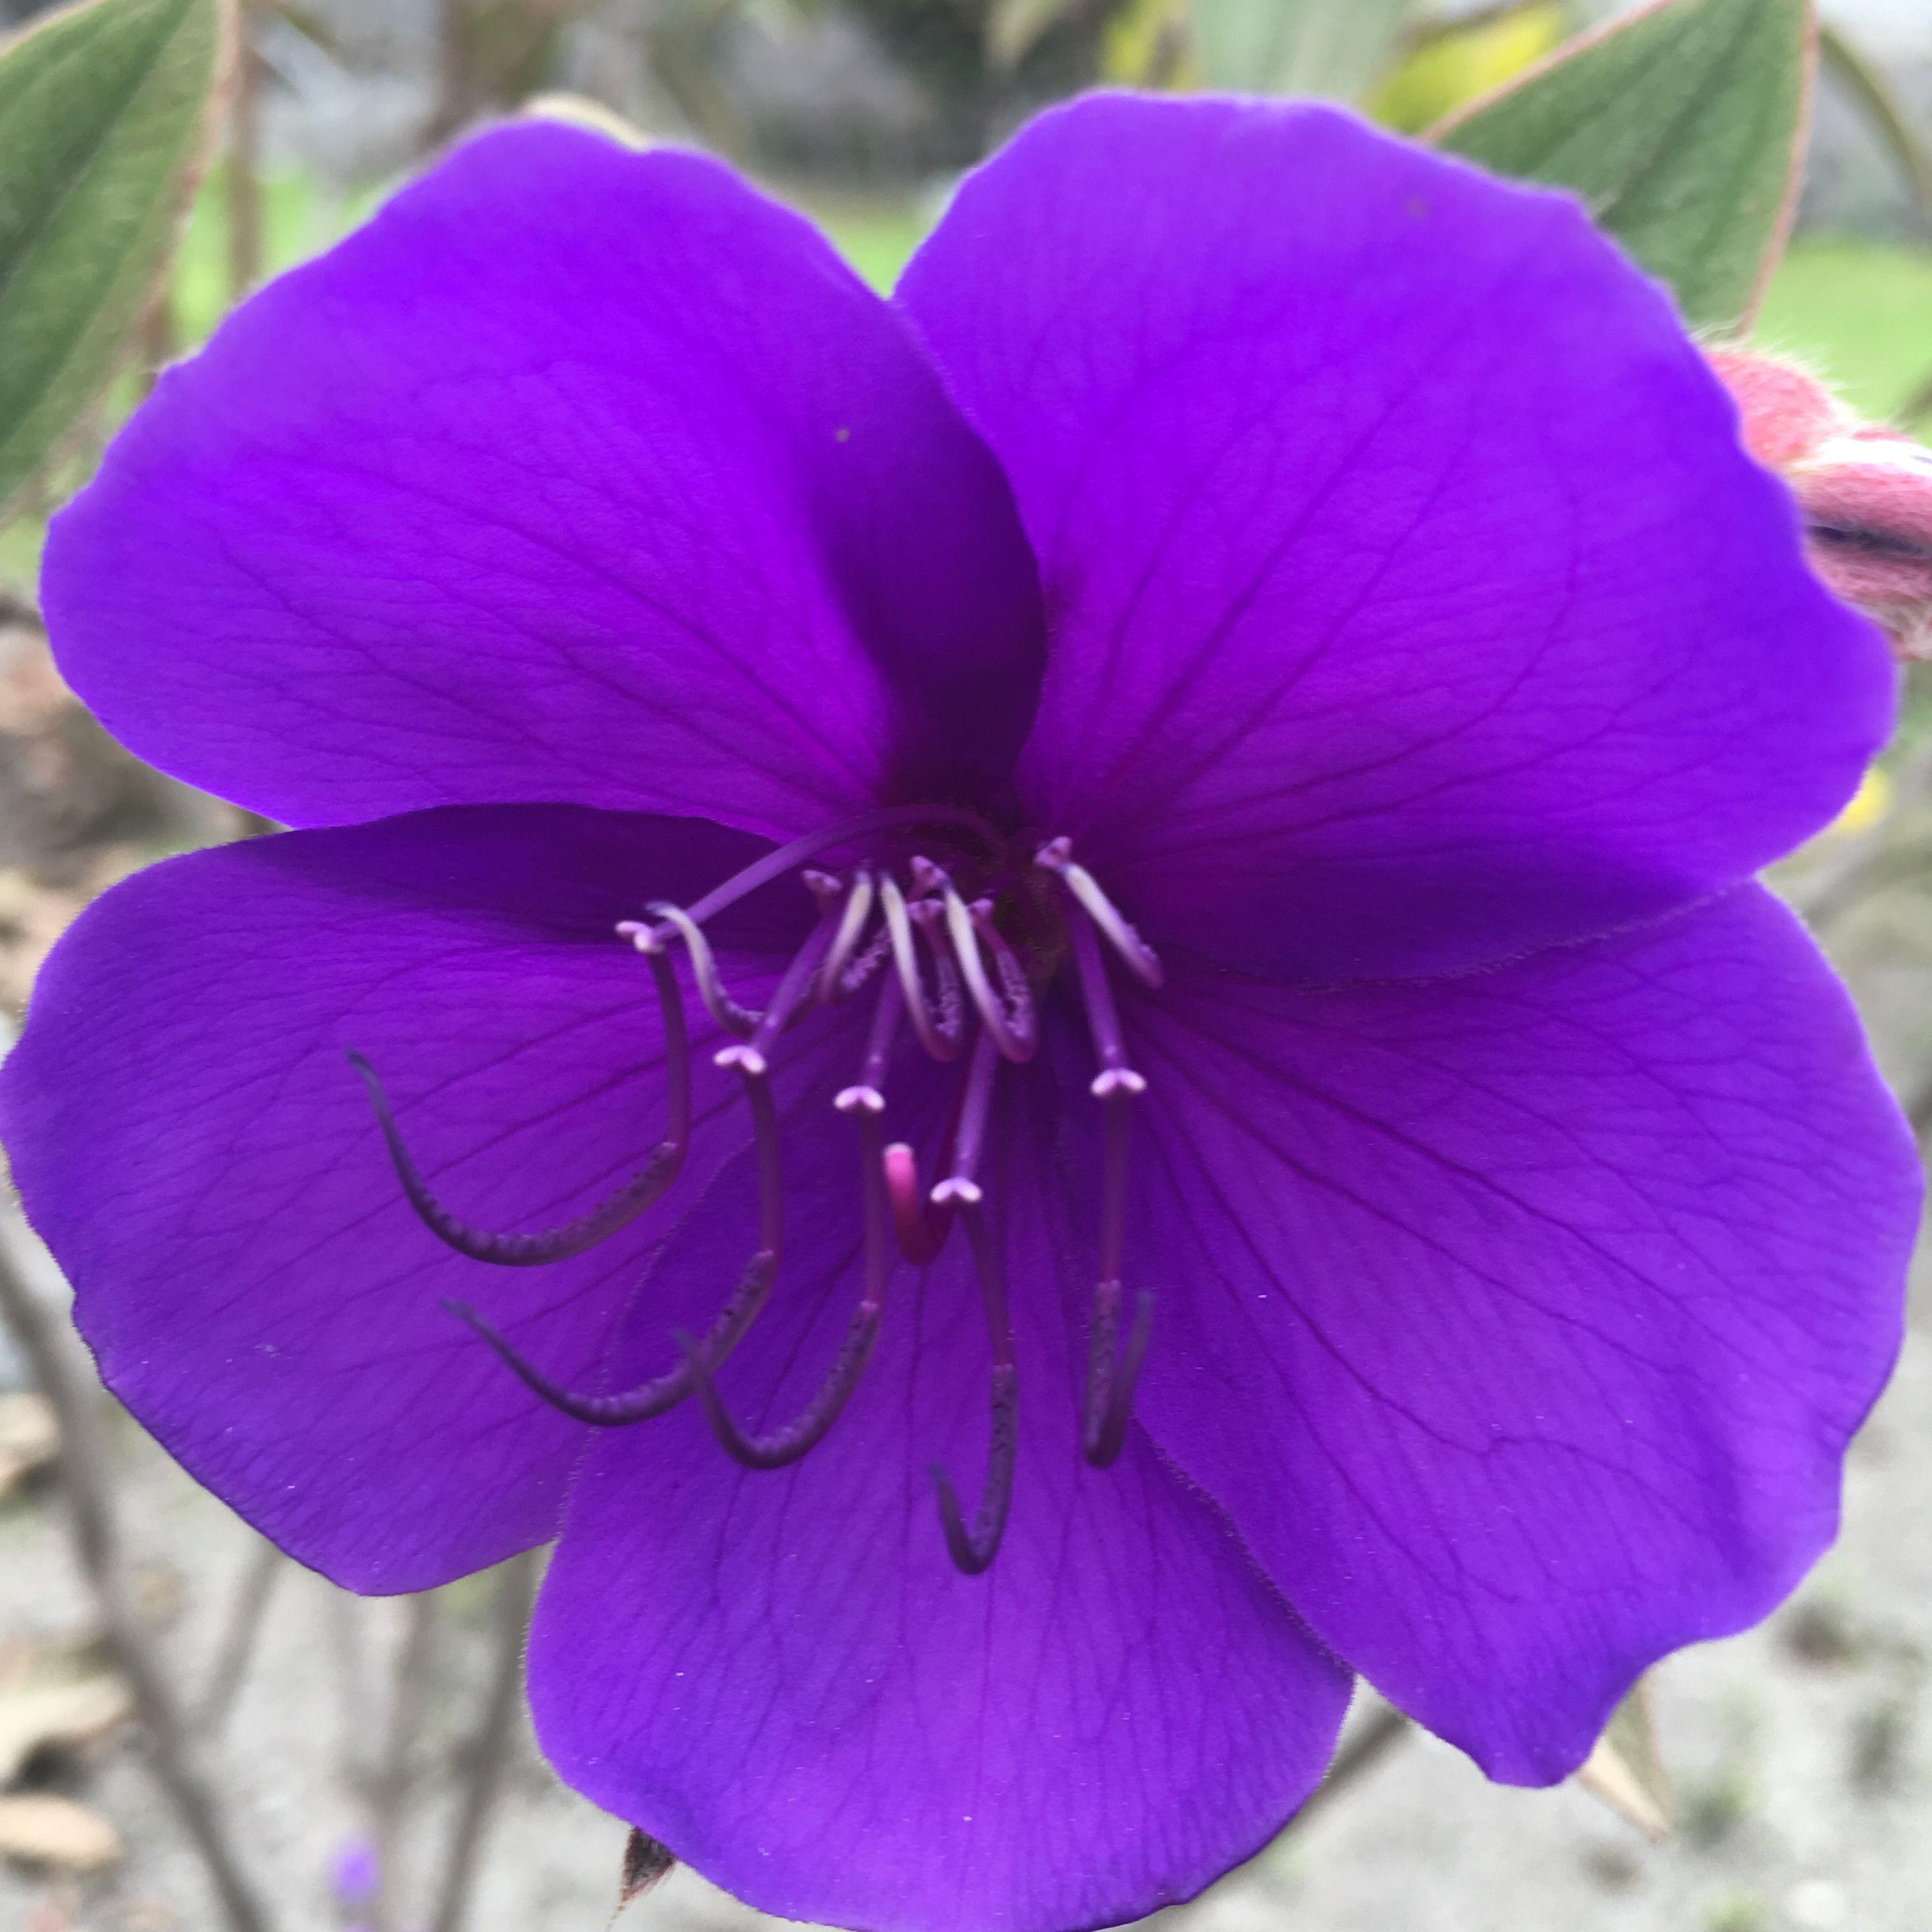 Flor pºrpura San Antonio de Pichincha Ecuador